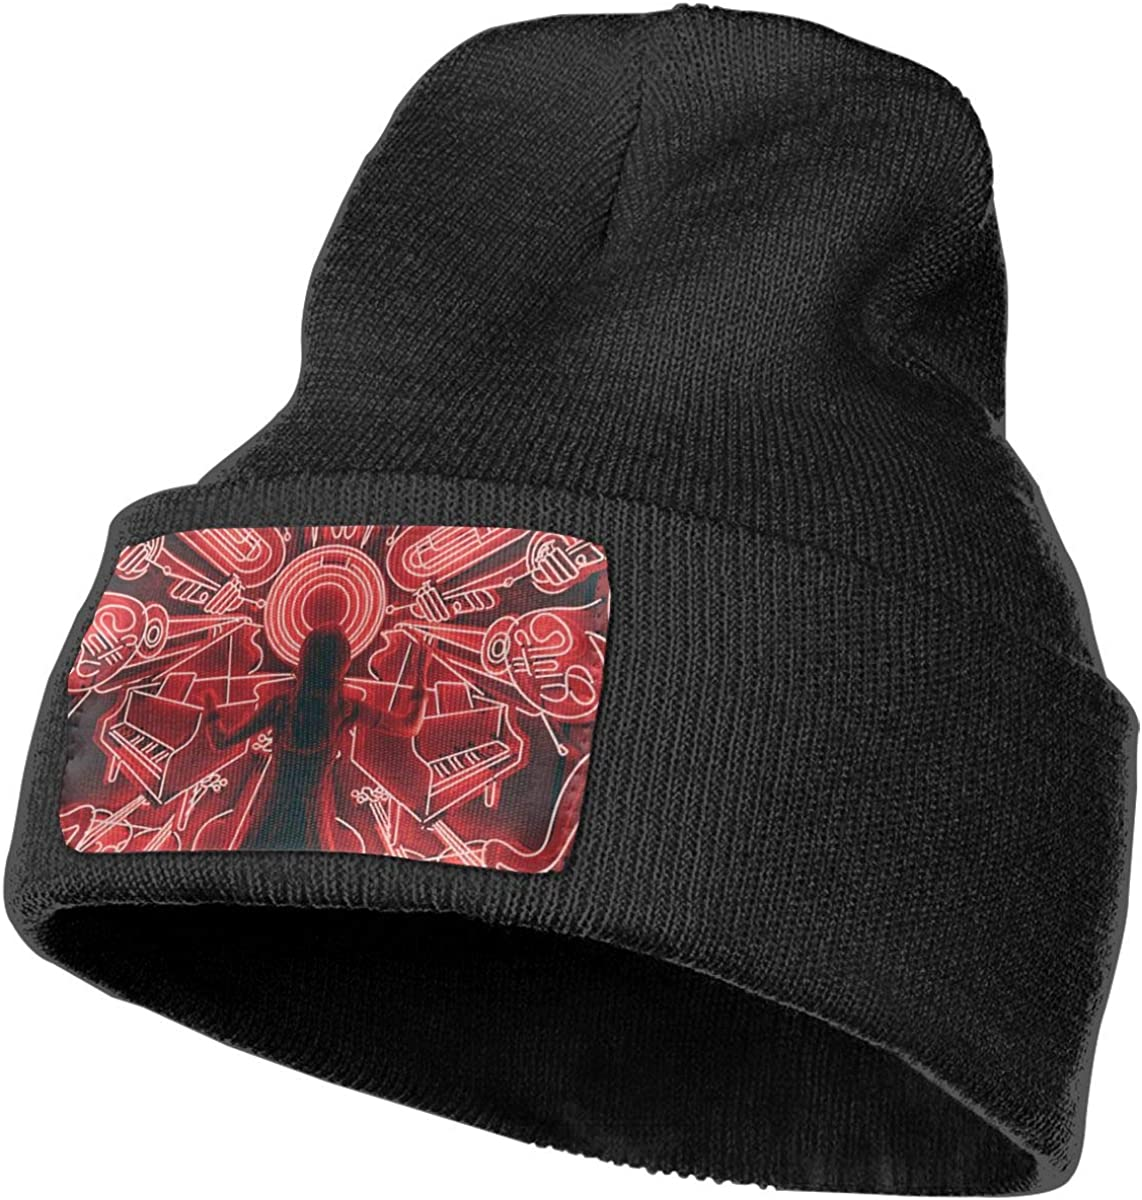 Beanie Hat Girl Light Back Knit Caps Men's Girls Warm Winter Fishing Ski Slouchy One Size